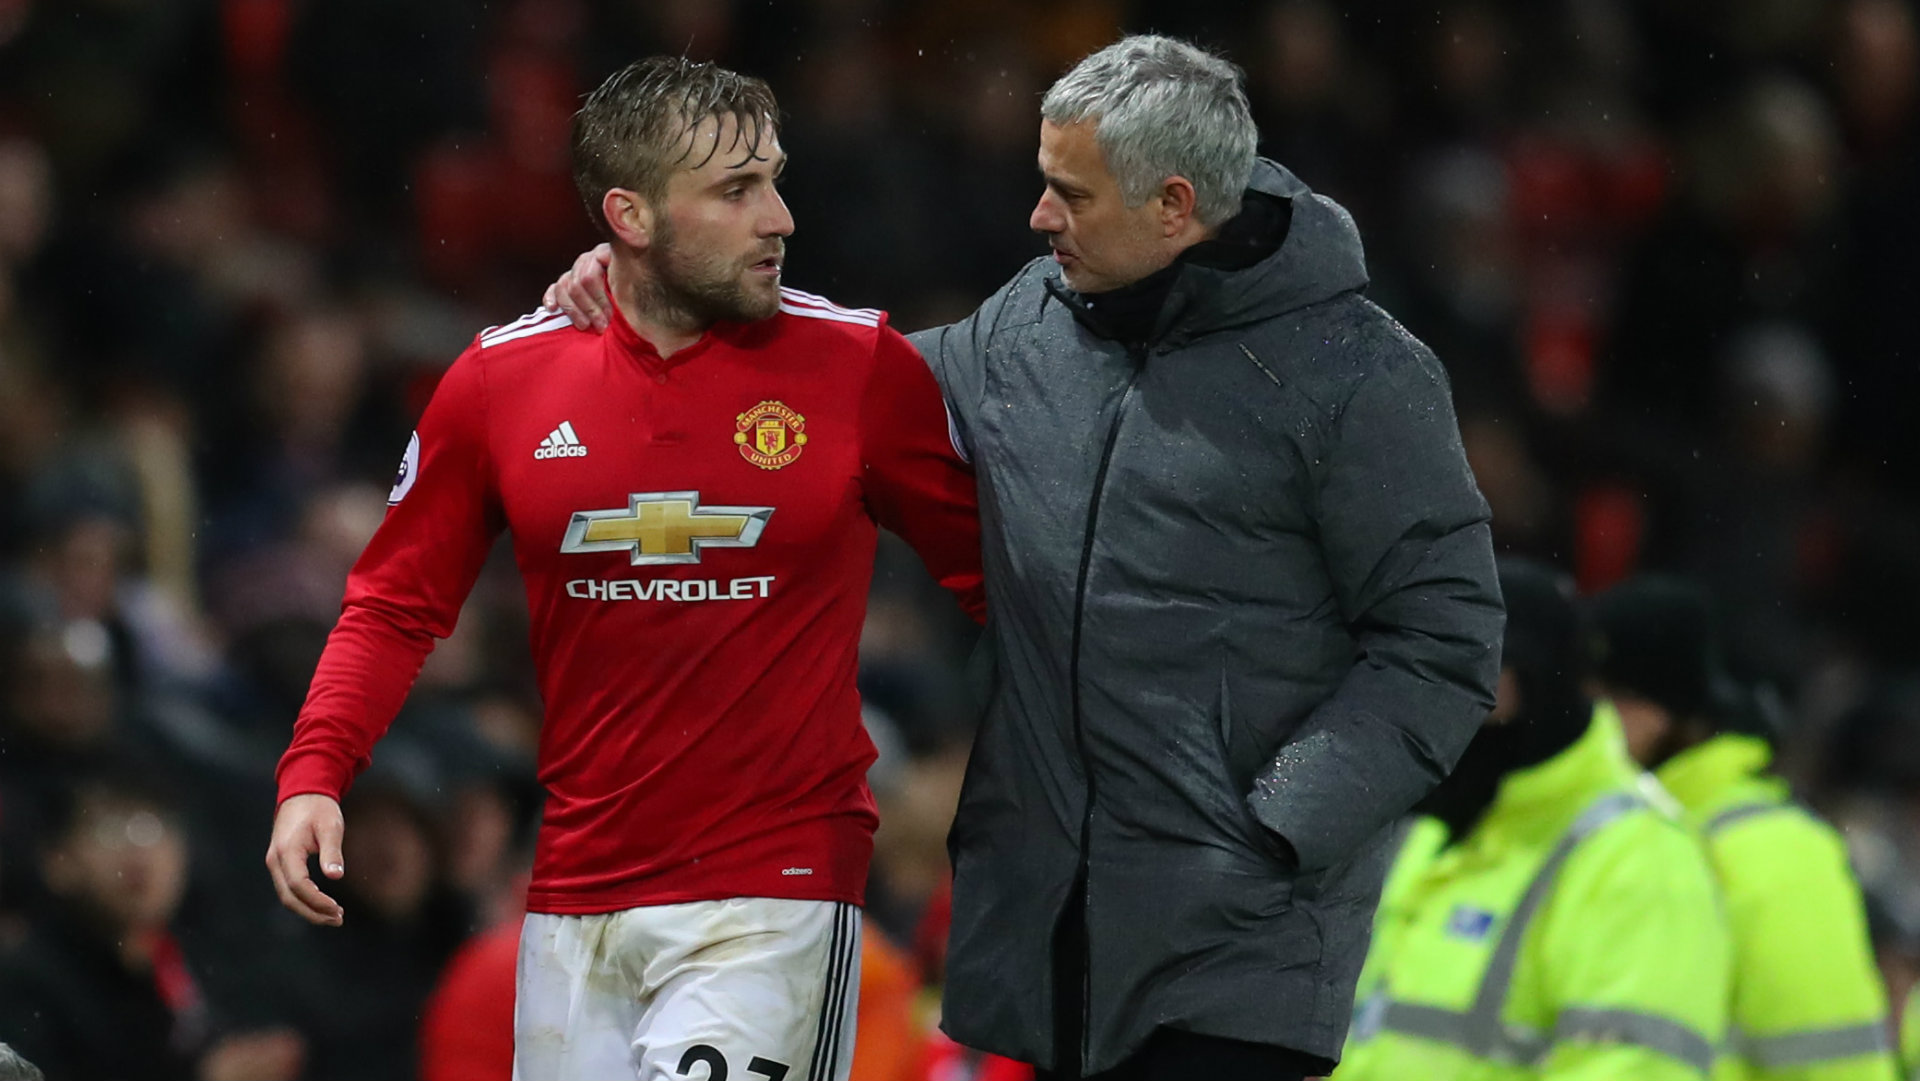 Luke Shaw, Jose Mourinho, Manchester United, 17/18